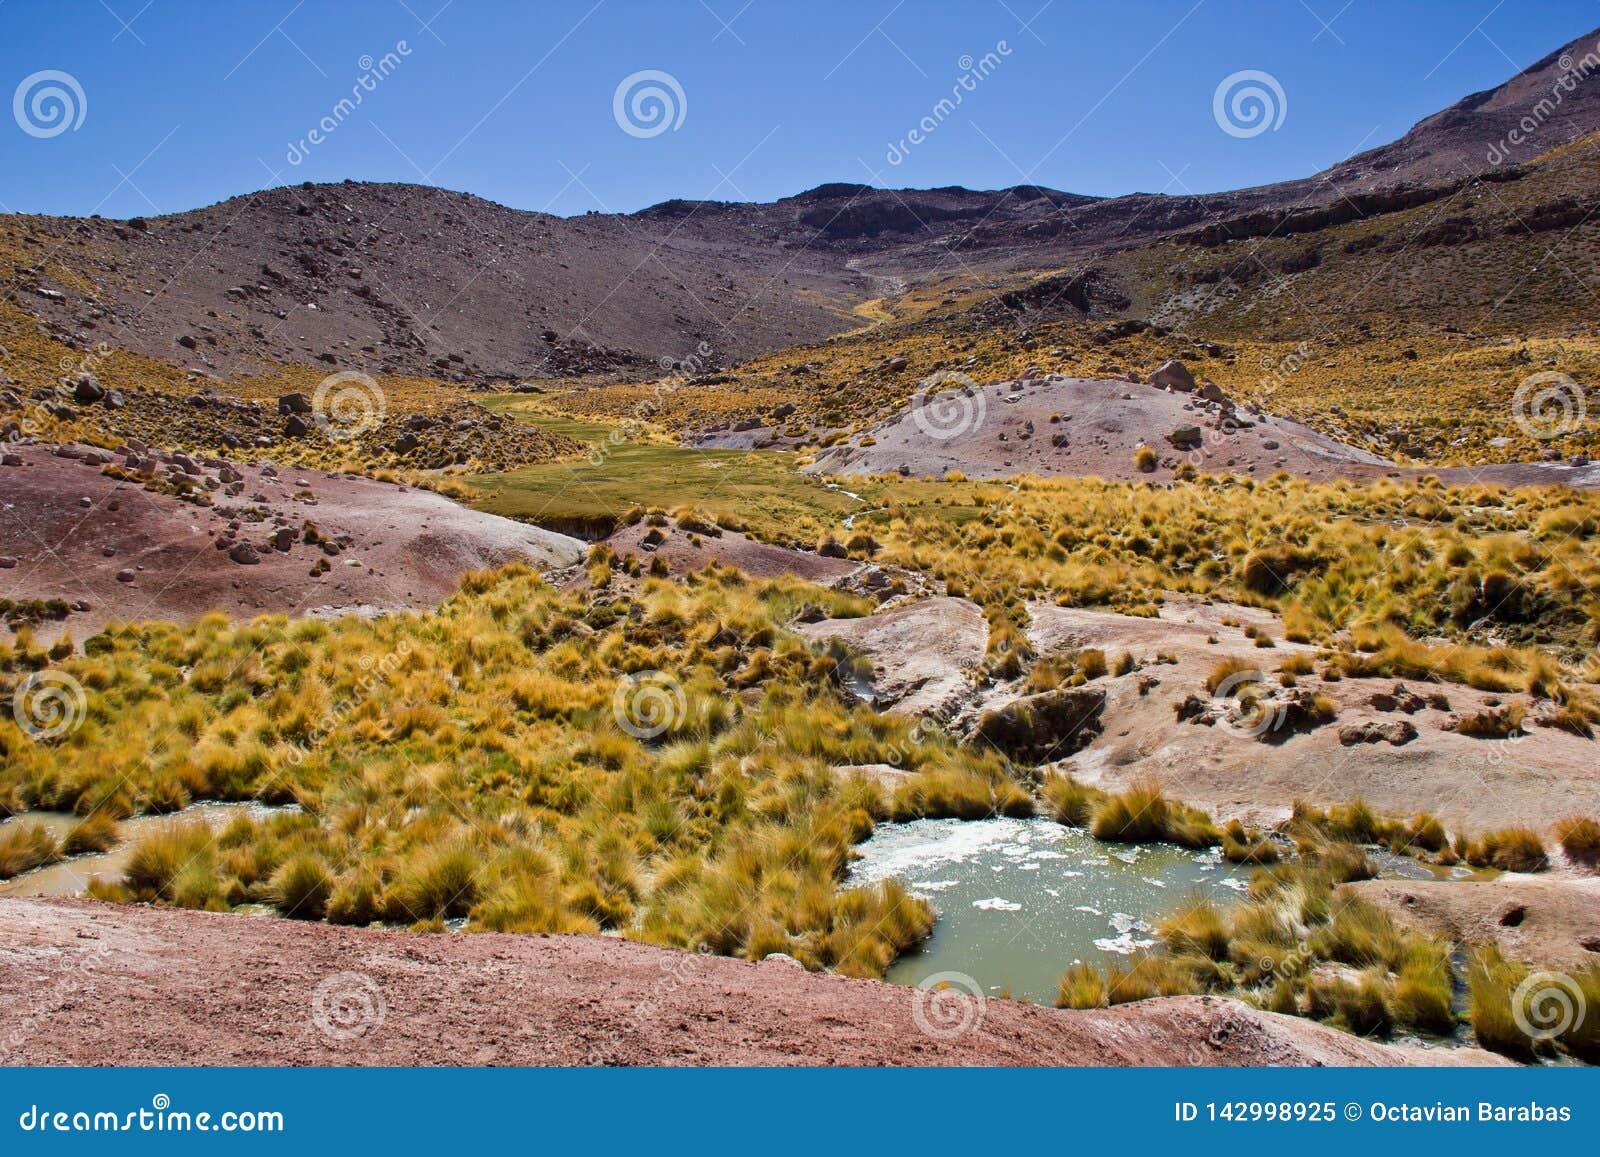 Paisaje en Chile/Atacama